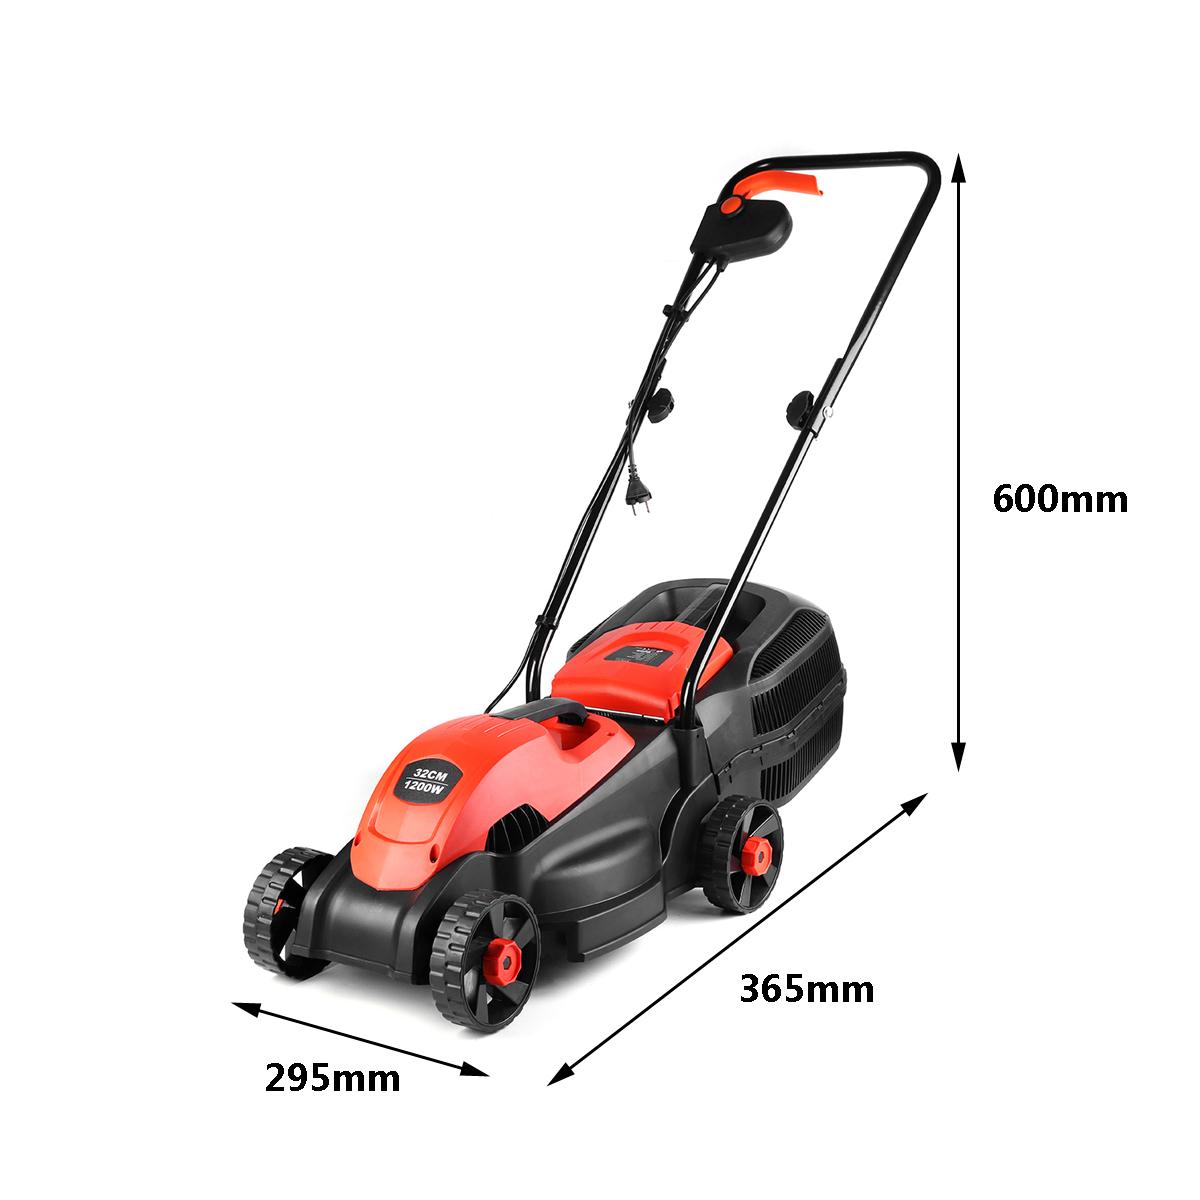 220V 1200W ZP4-320 Lawn Mower Electric lawnmower 3600r/min Grass Cutting Machine